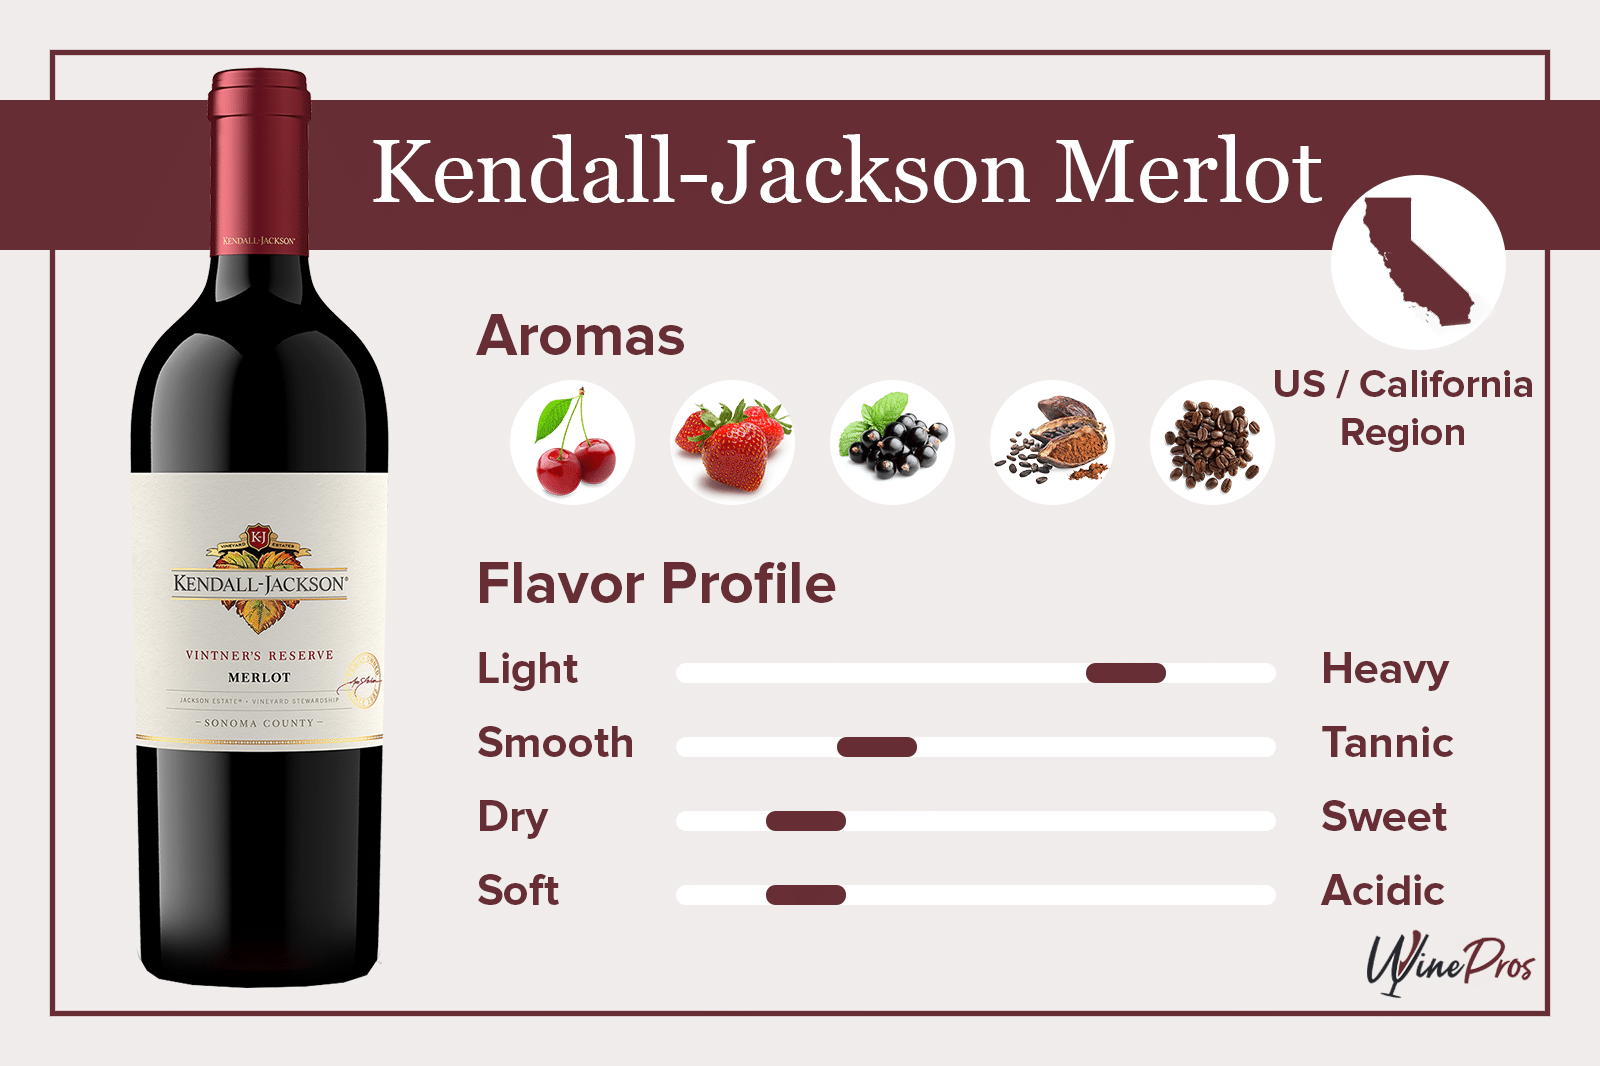 Kendall-Jackson Merlot Featured